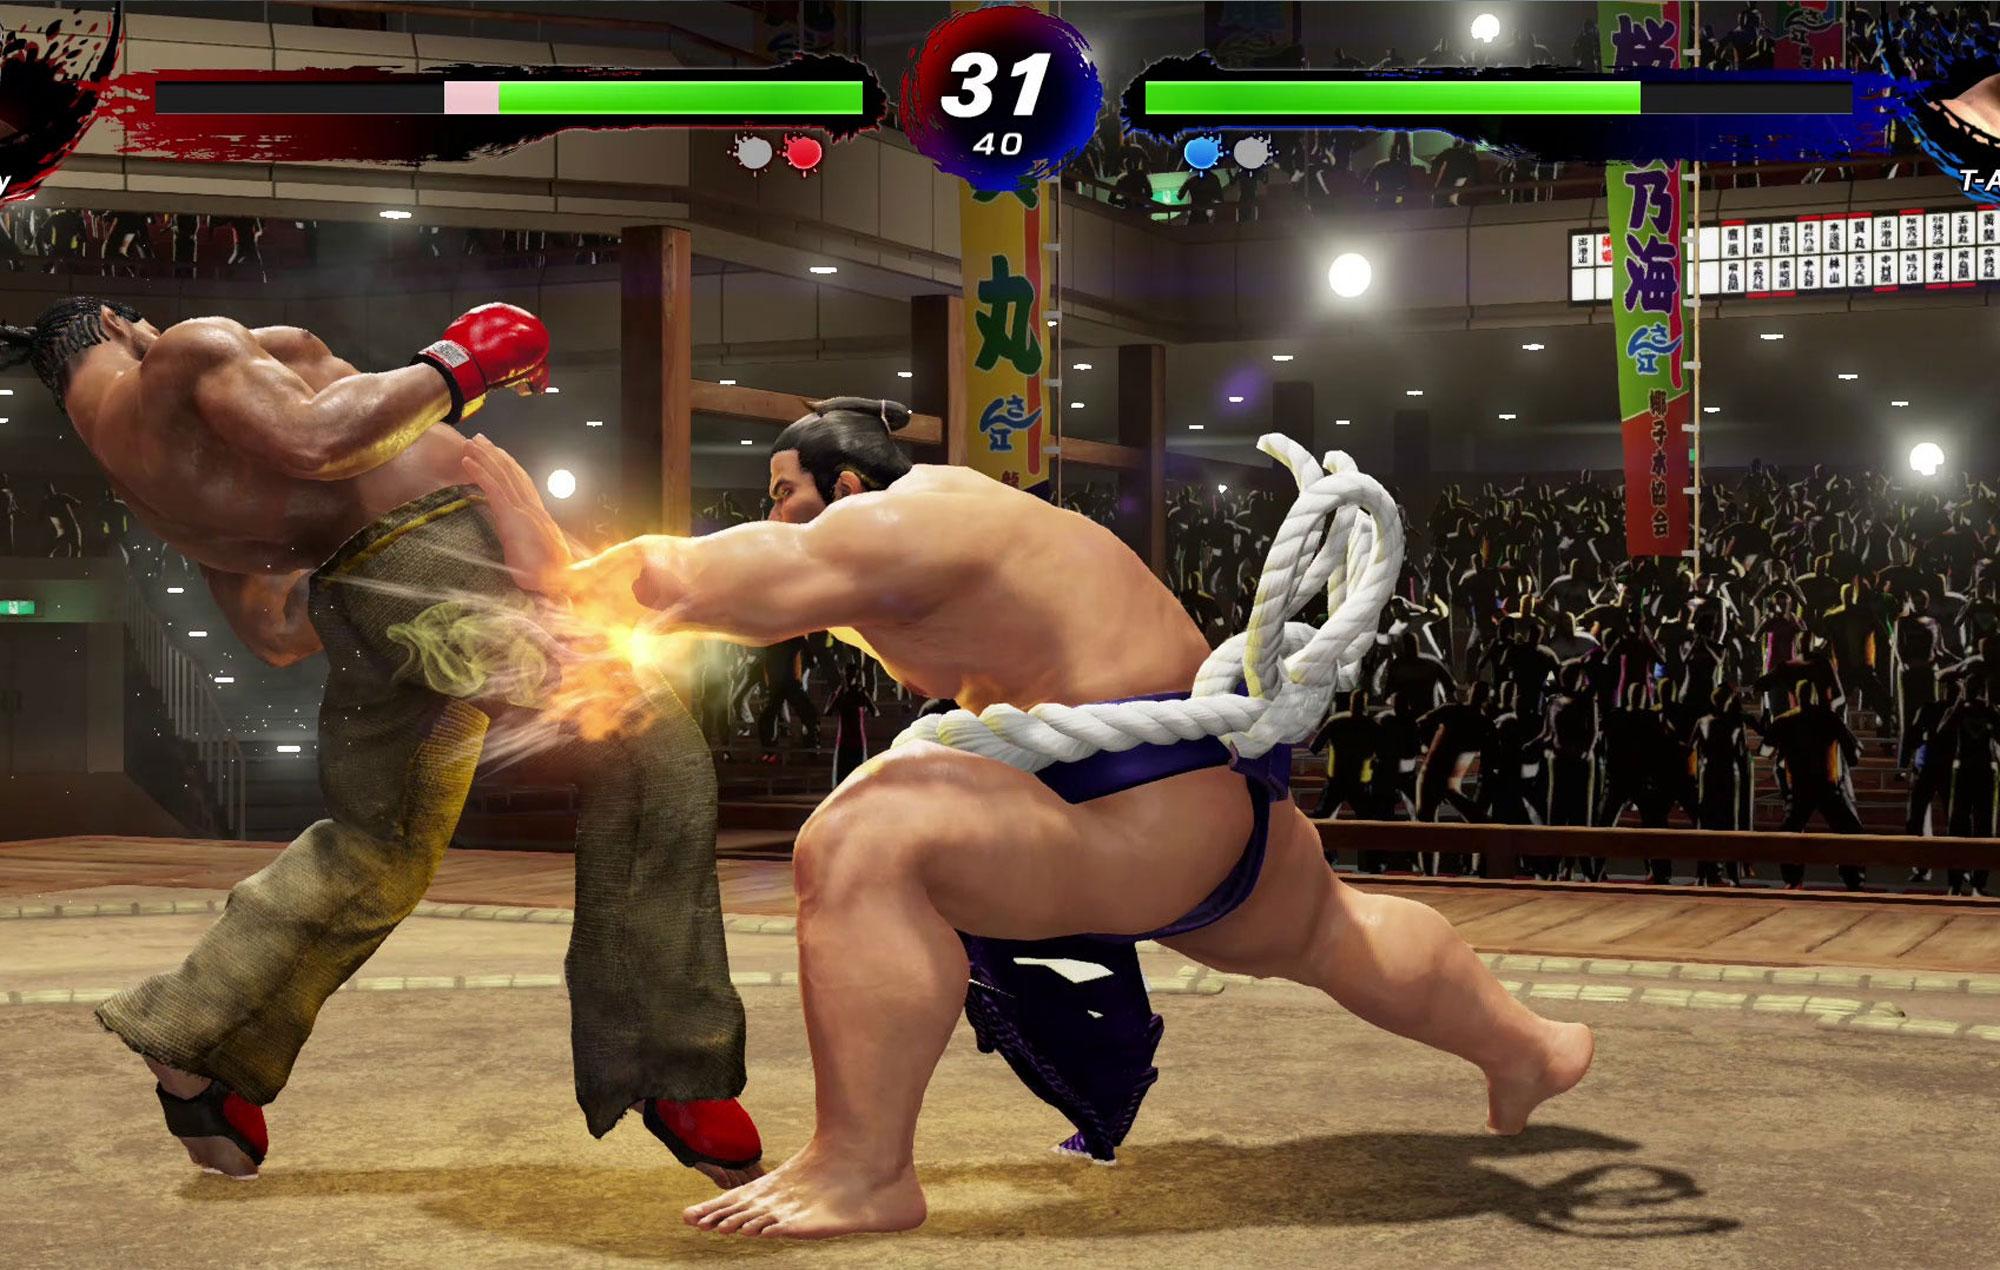 Virtua Fighter Virtua Fighter 5 Ultimate Edition Gameplay